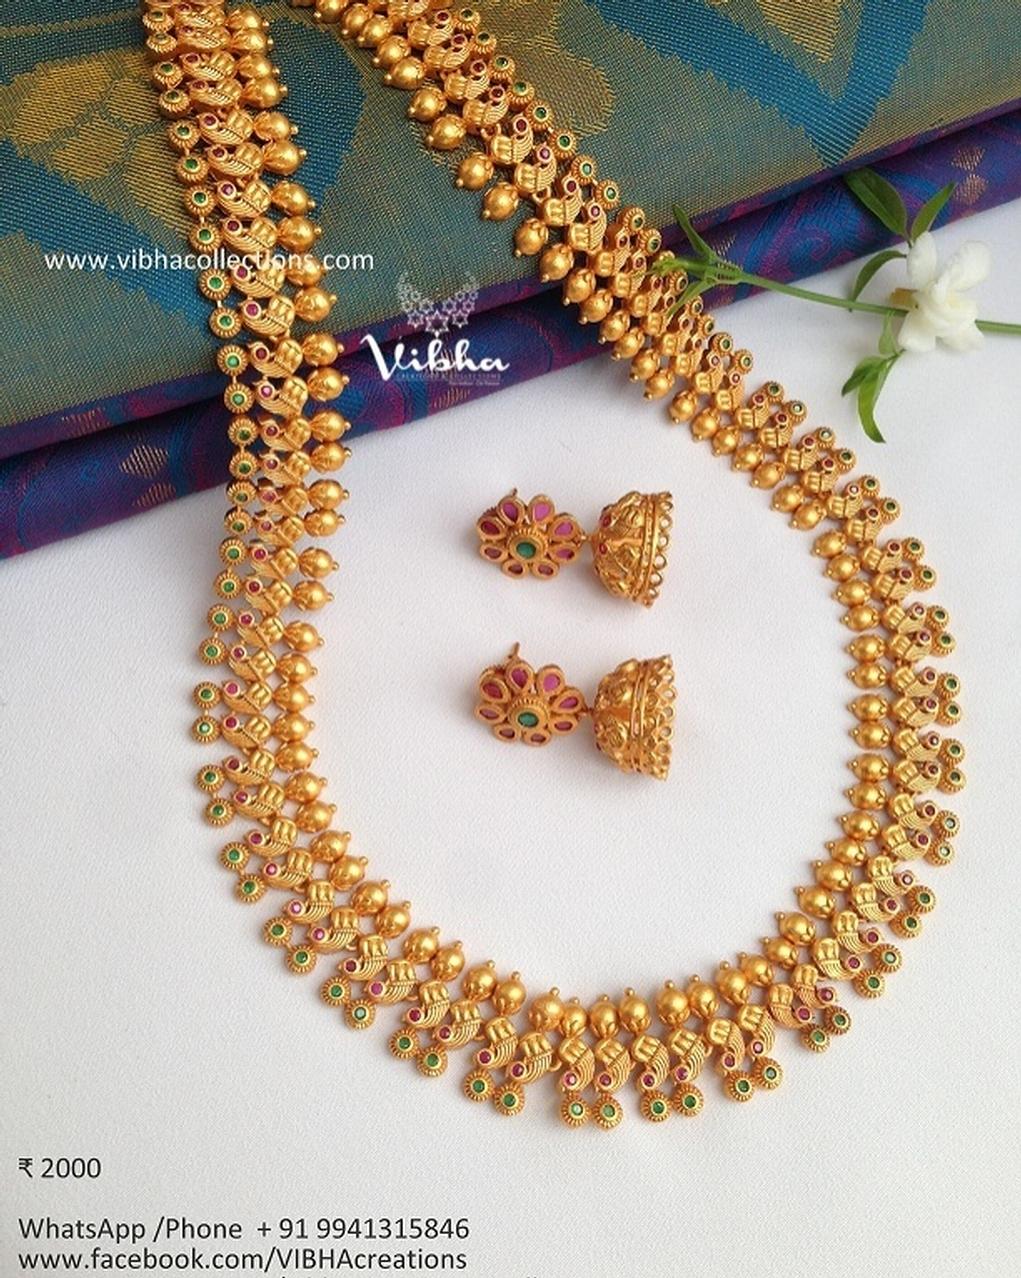 Amazing Necklace Set From Vibha Creations